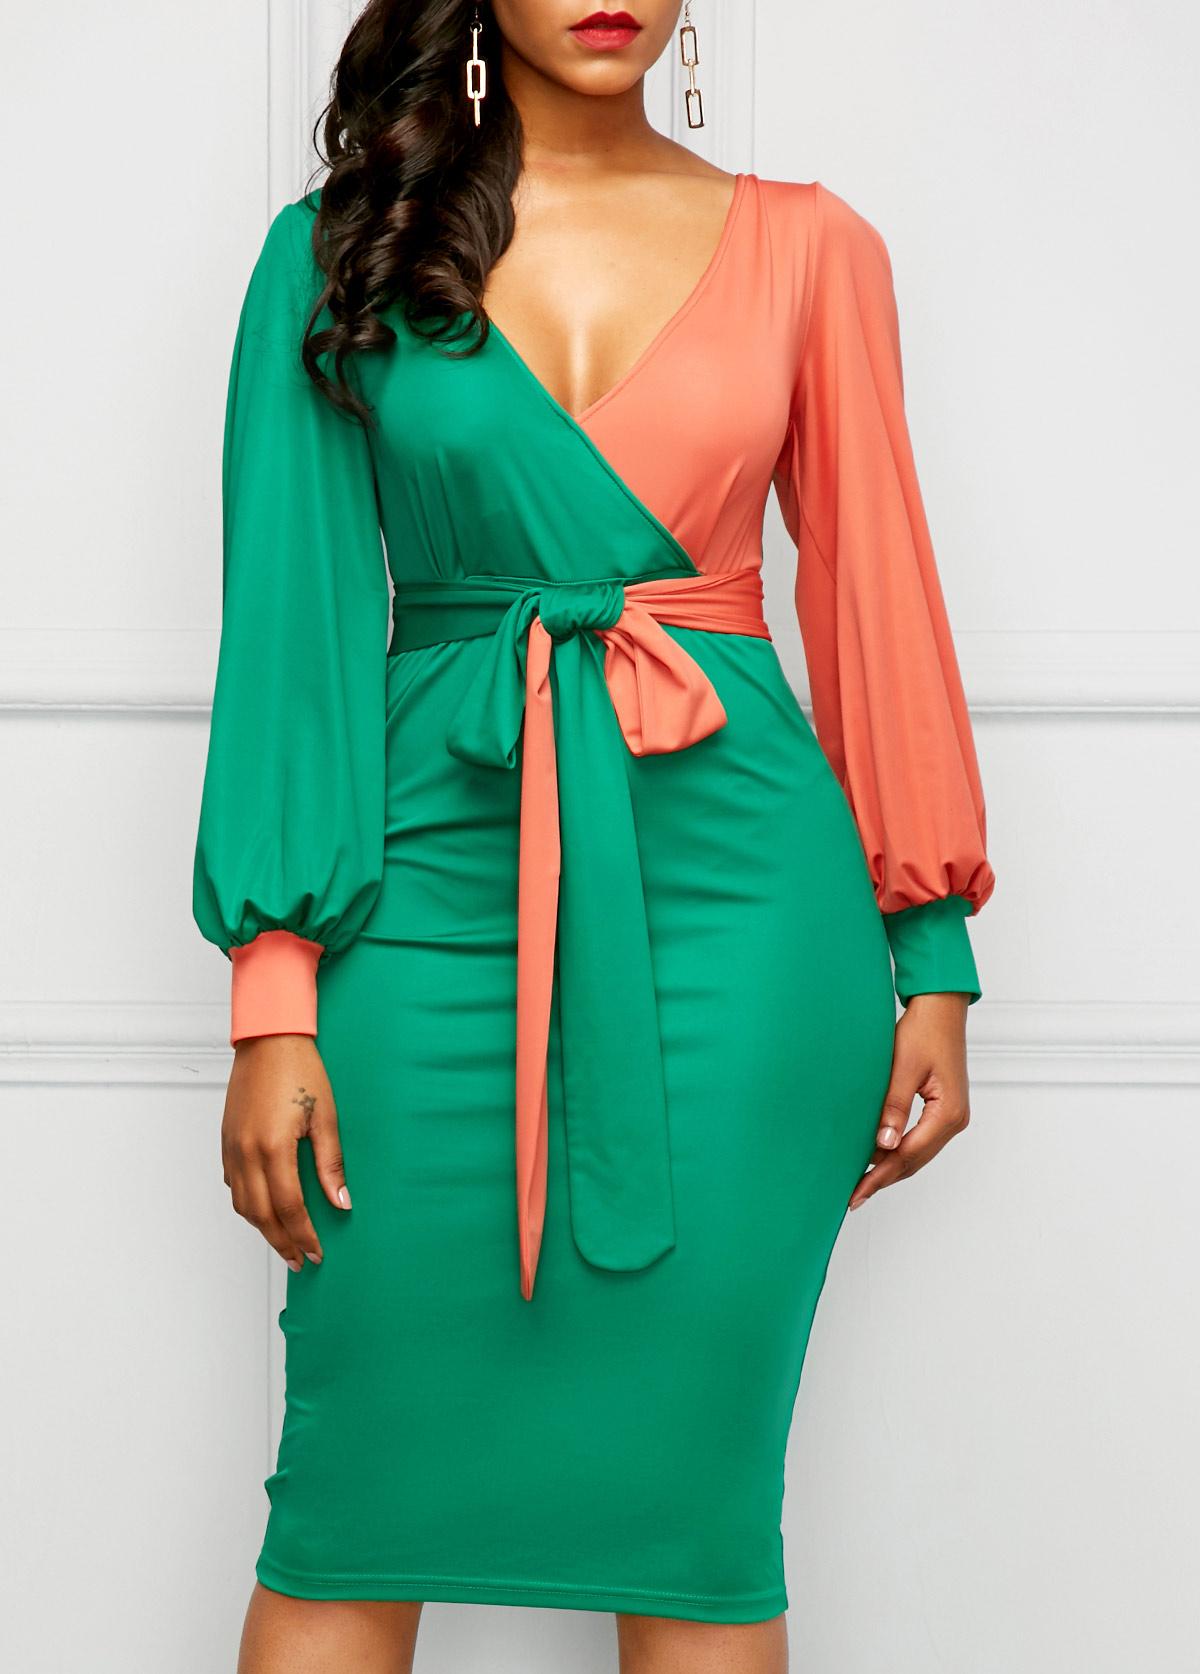 Open jewelry catalog Deep V Neck Plain Long Sleeve Bodycon Dresses lincoln